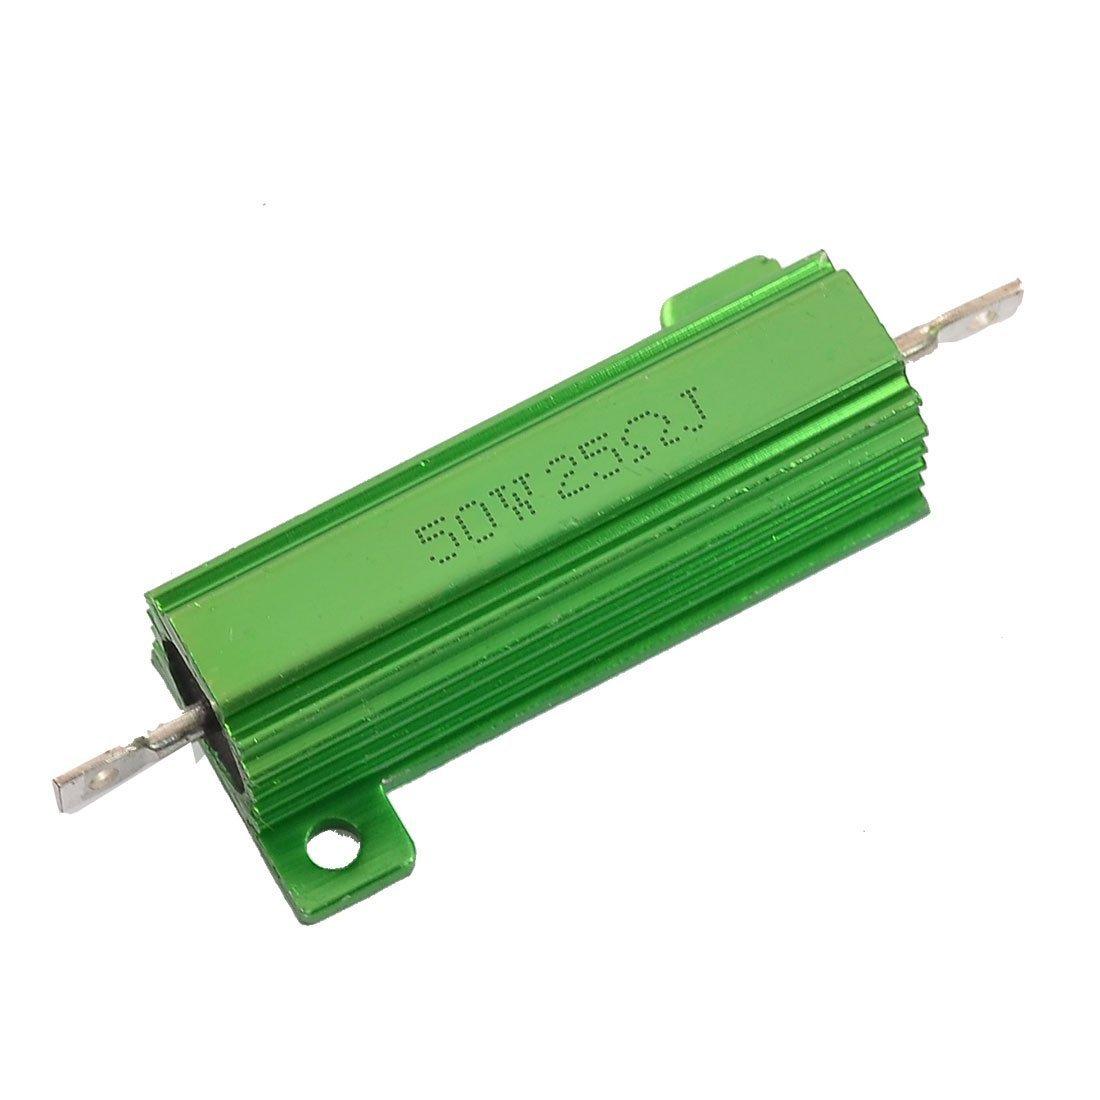 RilexAwhile Aluminum Shell Resistor 50W 25 Ohm Chassis Screw Tap Mounted Wirewound Resistors Green Heatsink